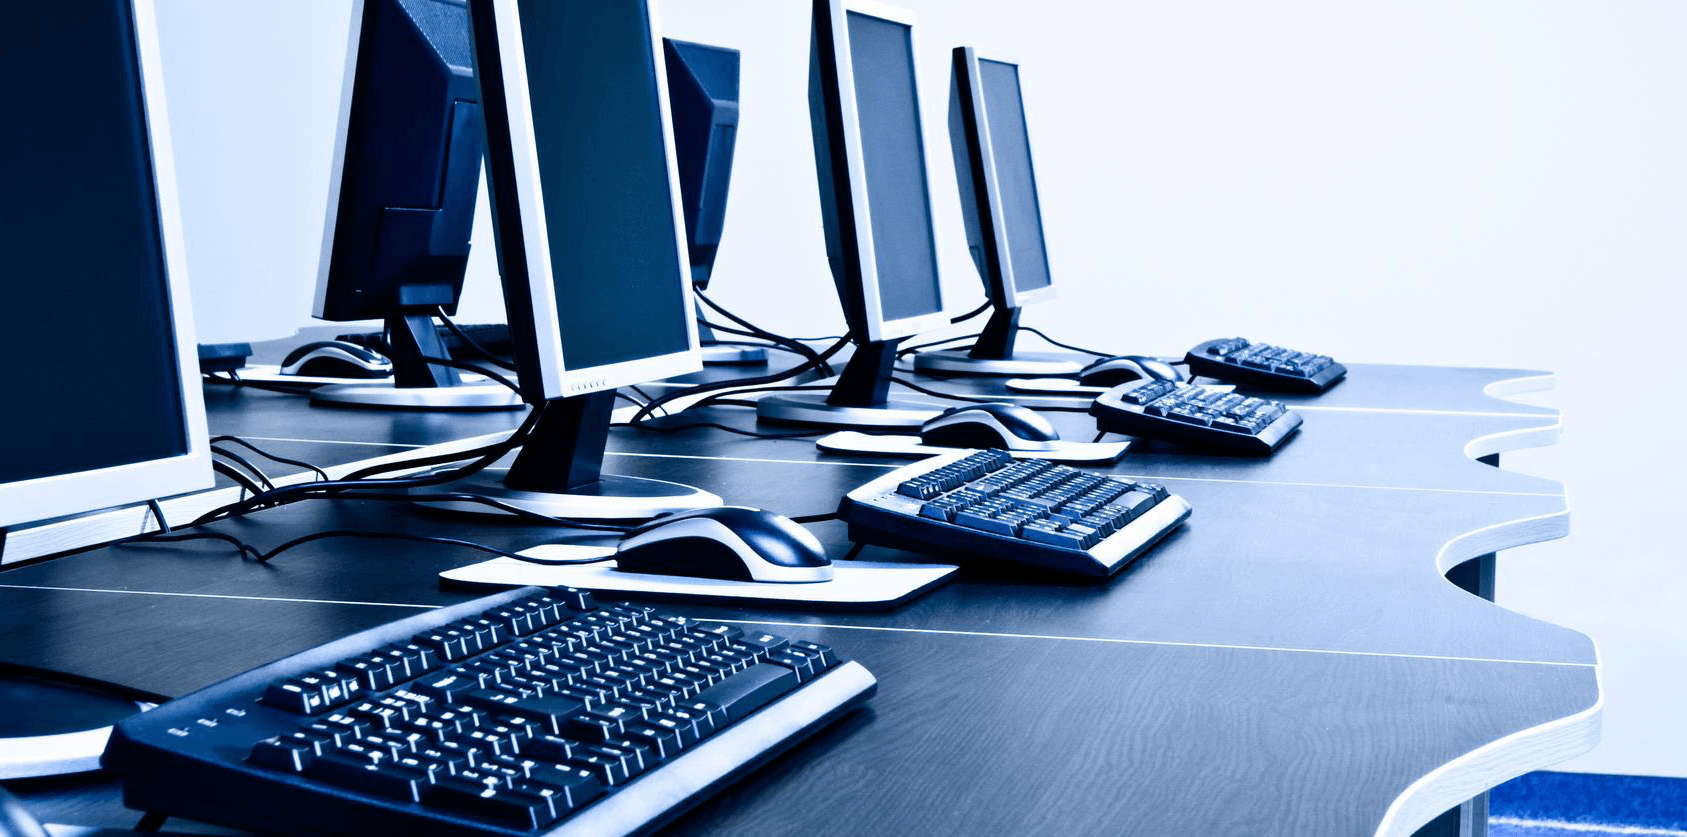 Photo of كتاااب غاية في الاهمية لتعليم الحاسب الالي من الصفر وحتي الاحتراف مجانا